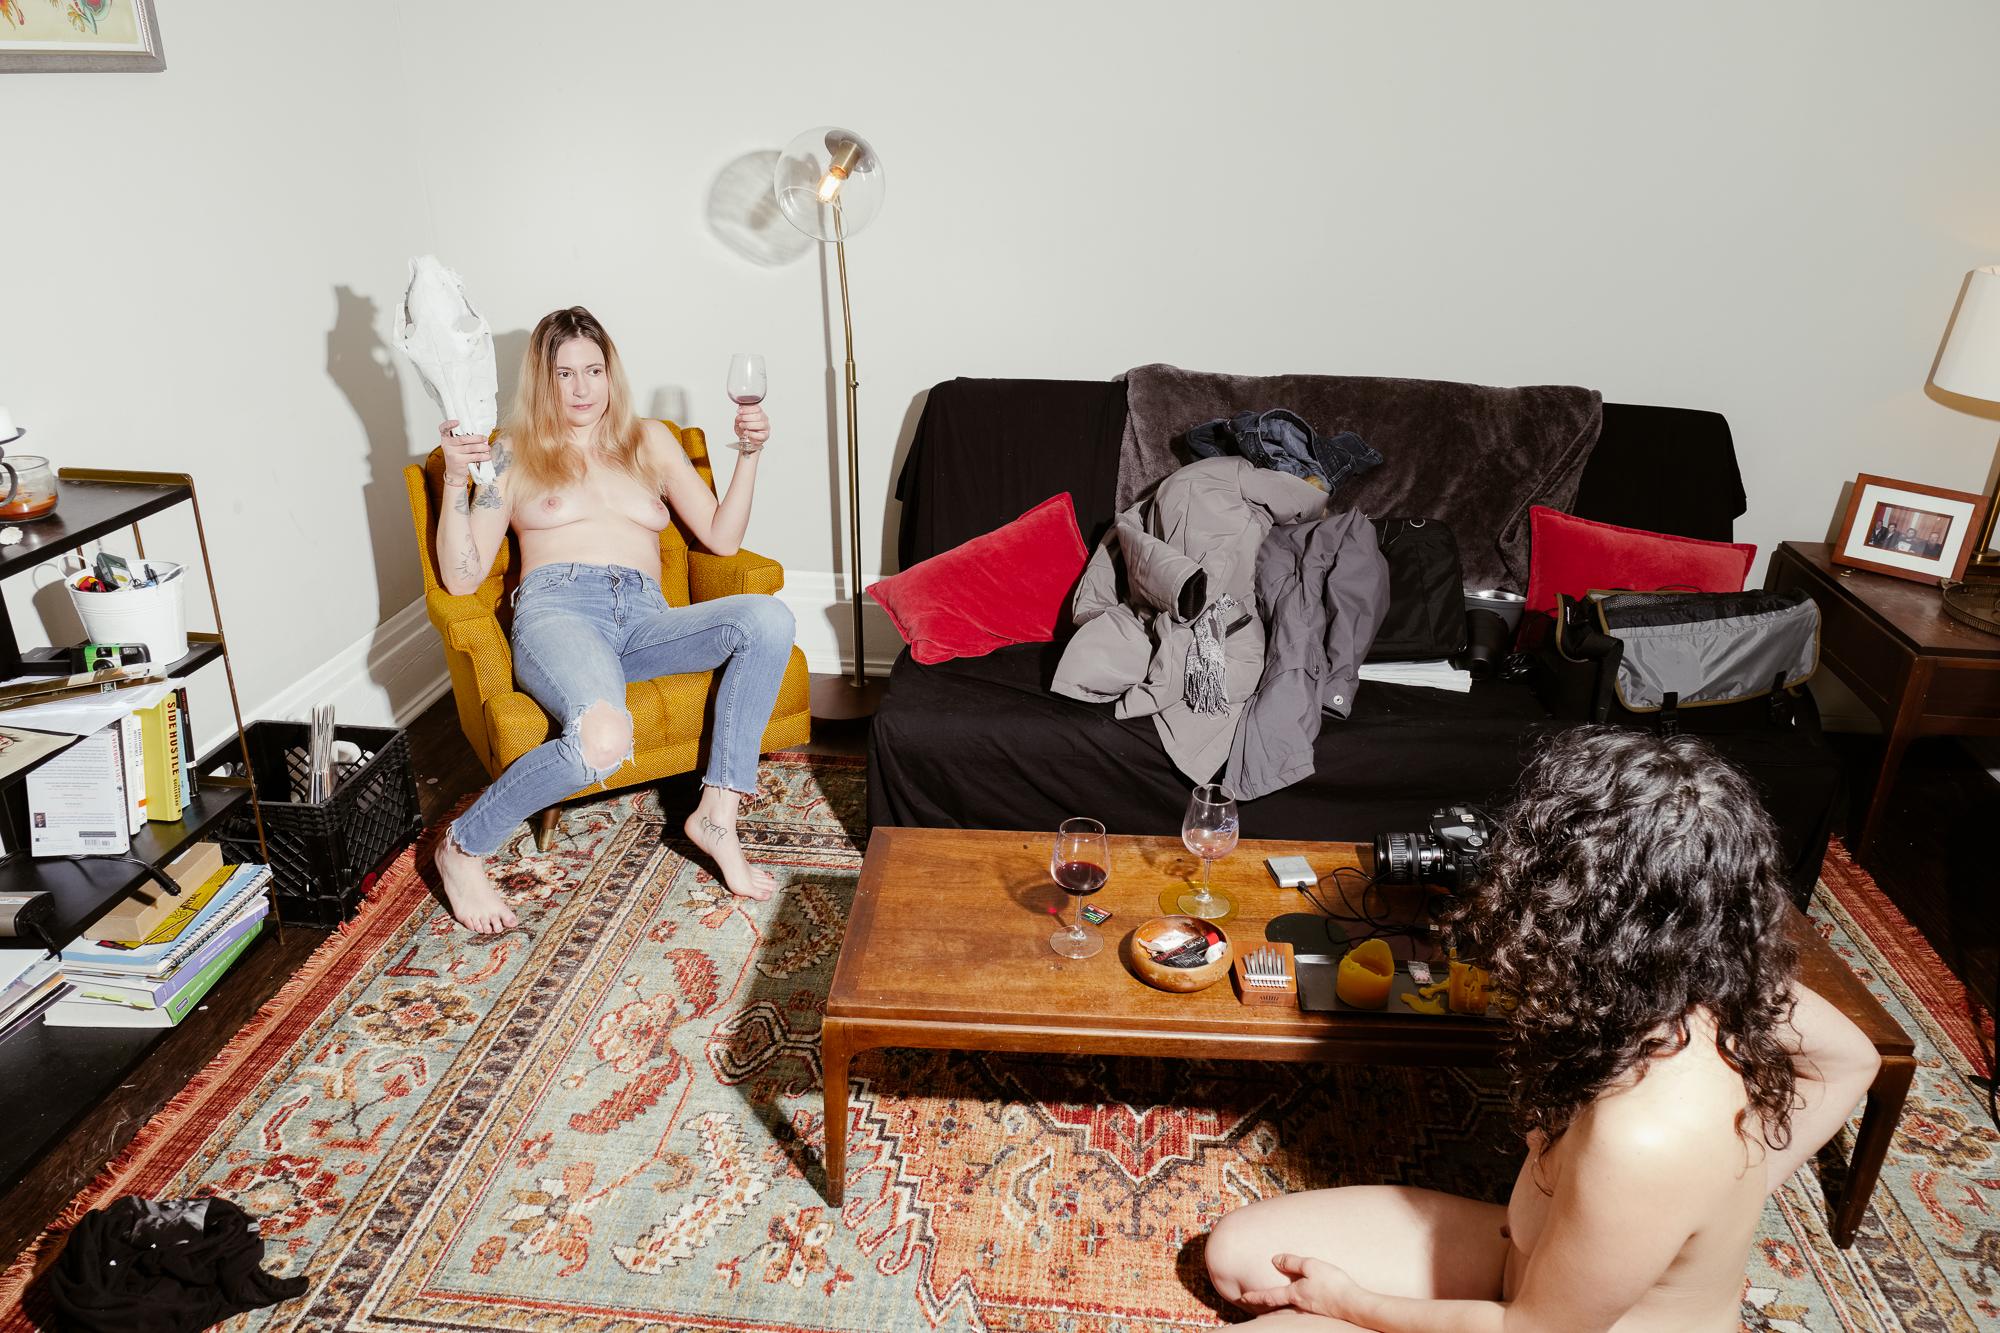 20181128-Brandi-Hannah-apartment-X-T2-0152-Edit.jpg